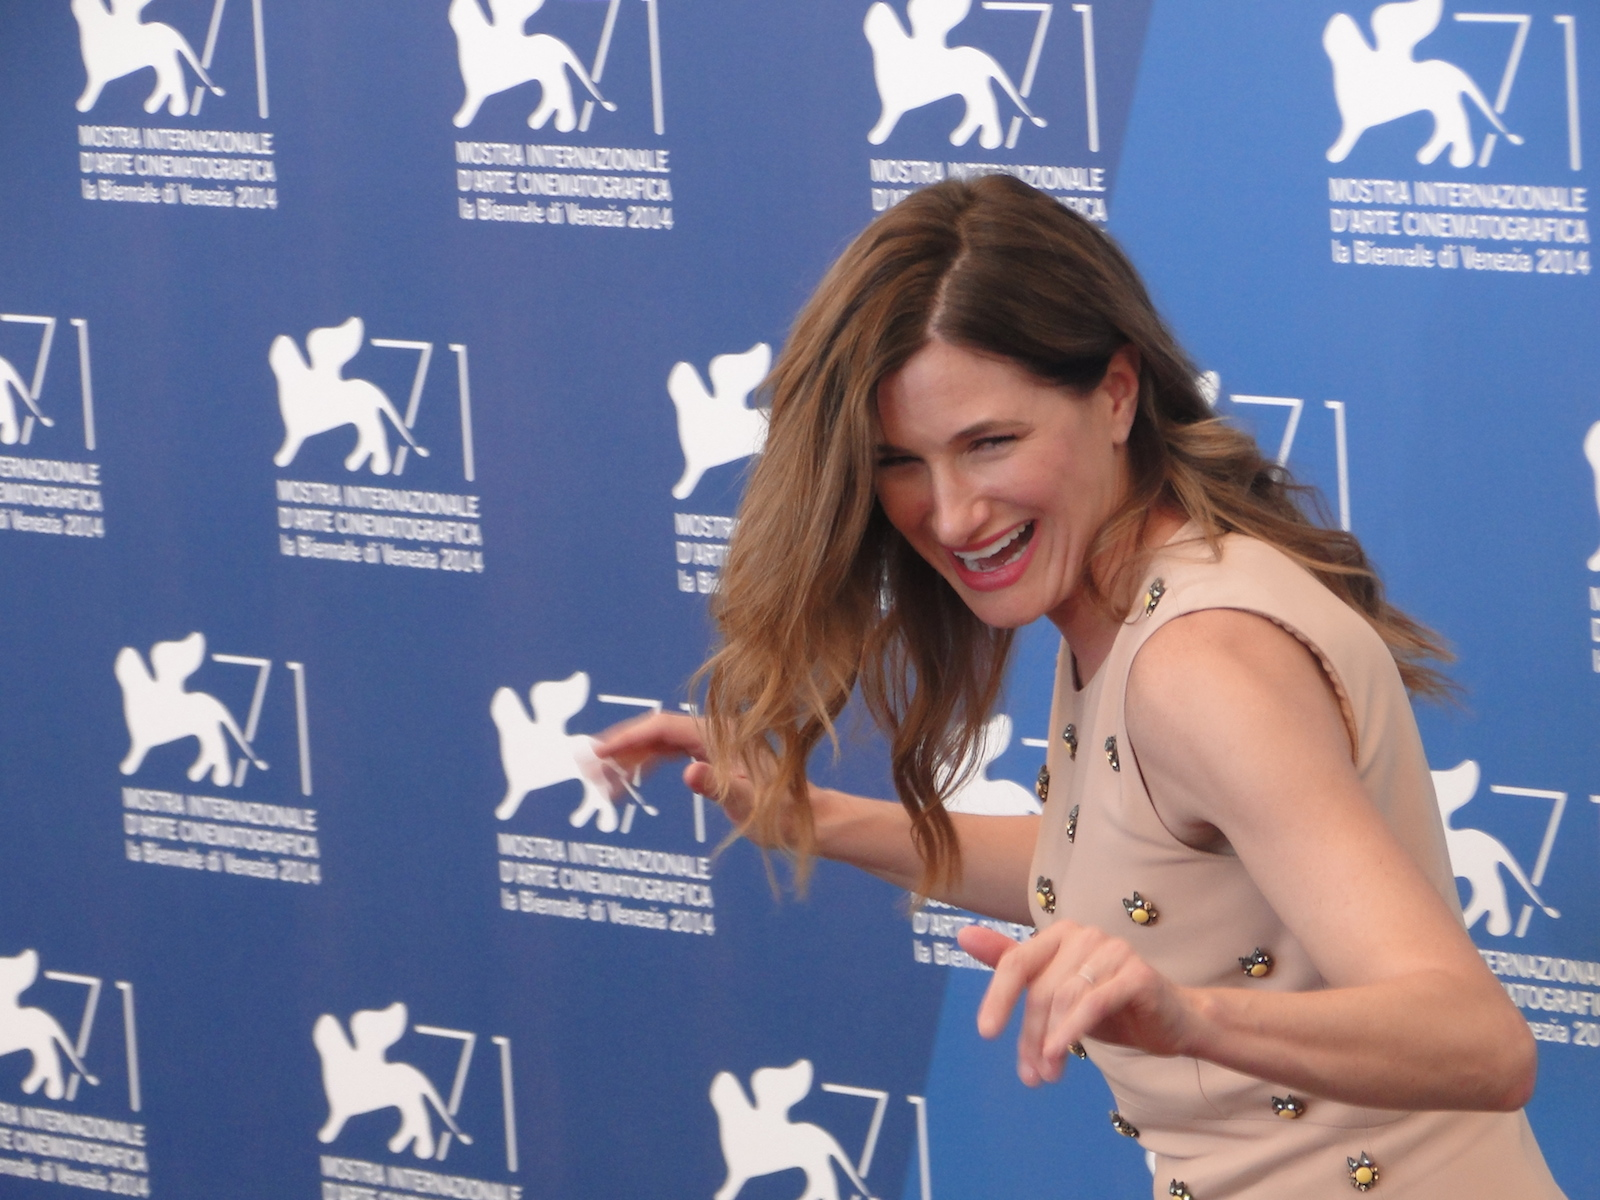 Venezia 2014: Kathryn Hahn scherza al photocall di She's Funny That Way